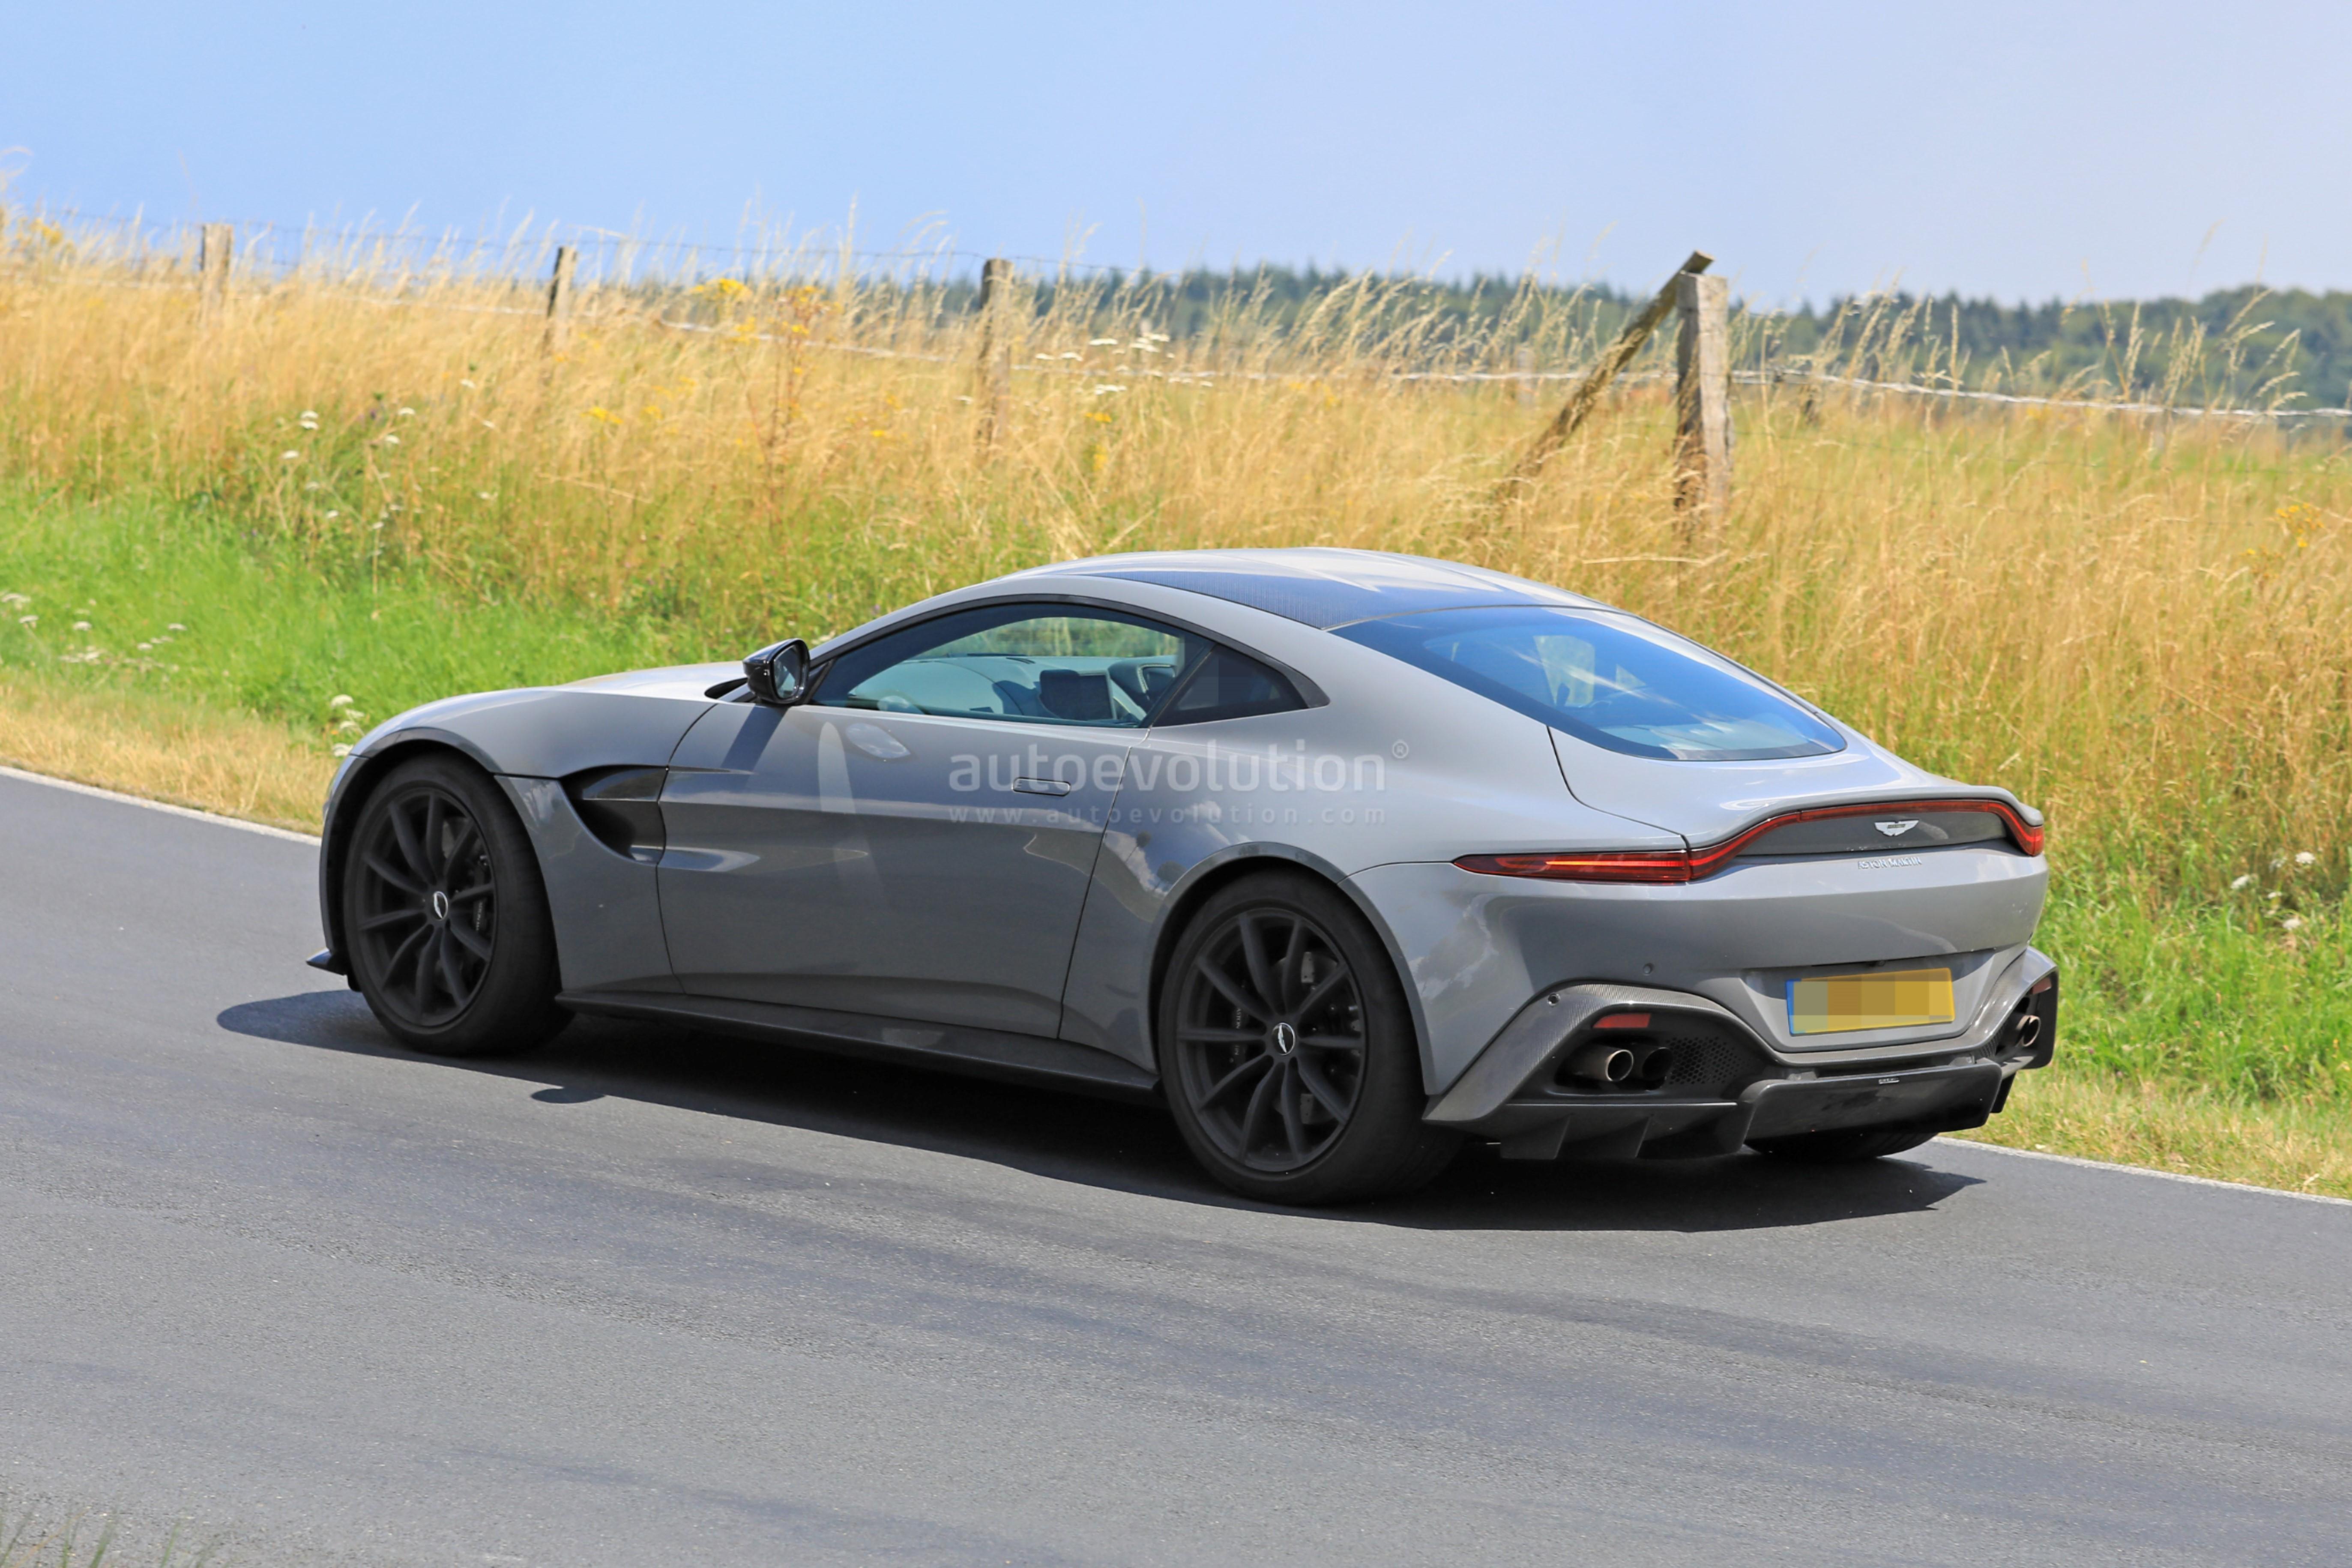 2020 Aston Martin V8 Vantage S Test Mule Spied Near The Nurburgring Autoevolution